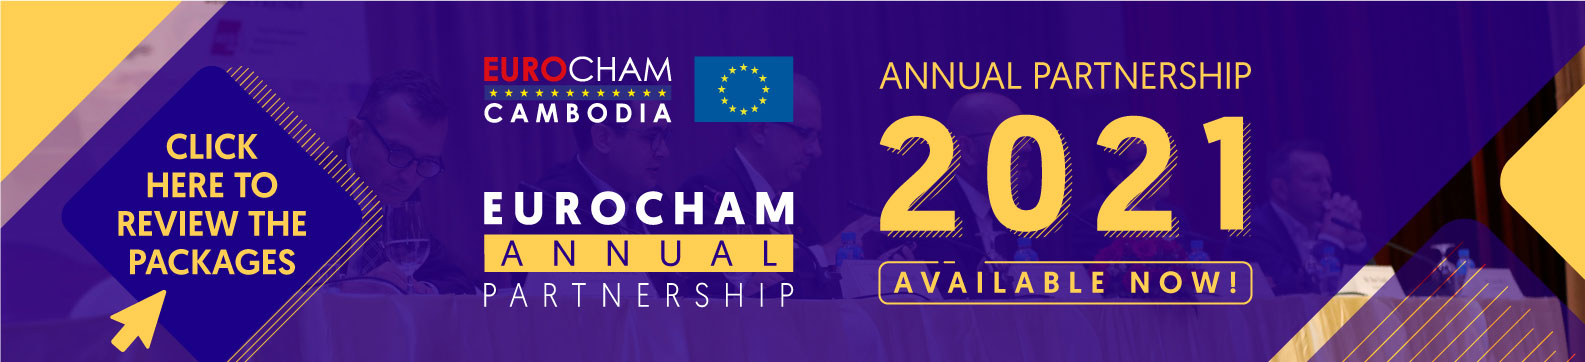 EuroCham Cambodia - Annual Partnership